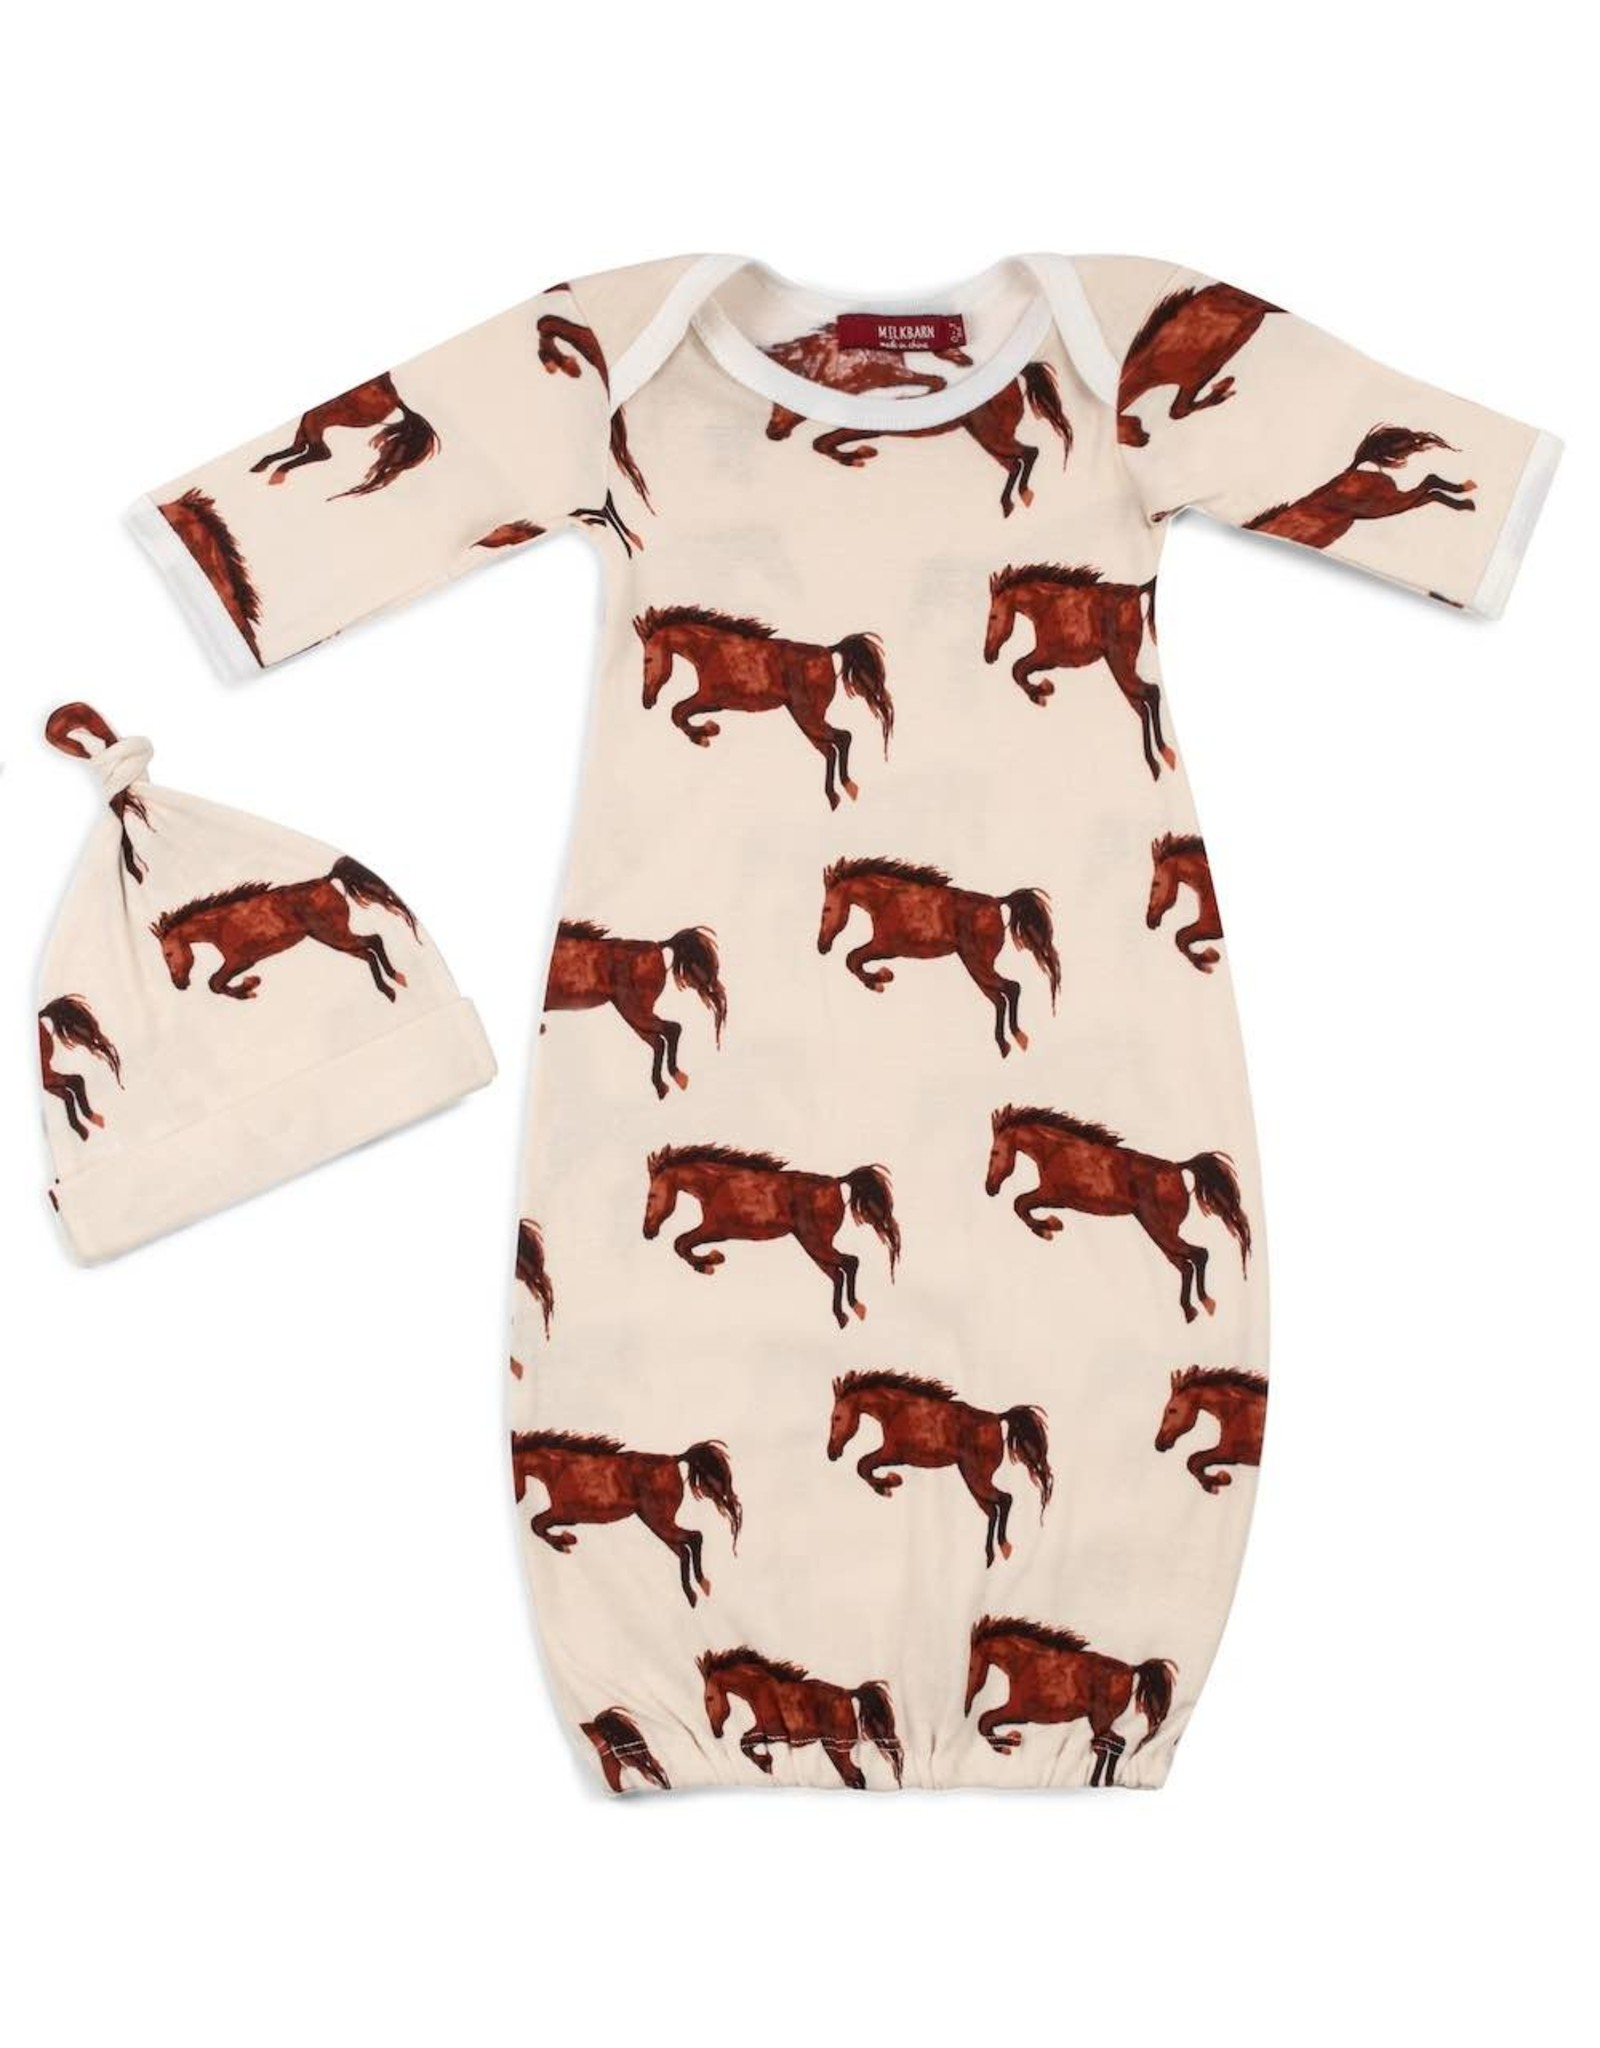 MilkBarn Bamboo Gown and Hat Set-Newborn